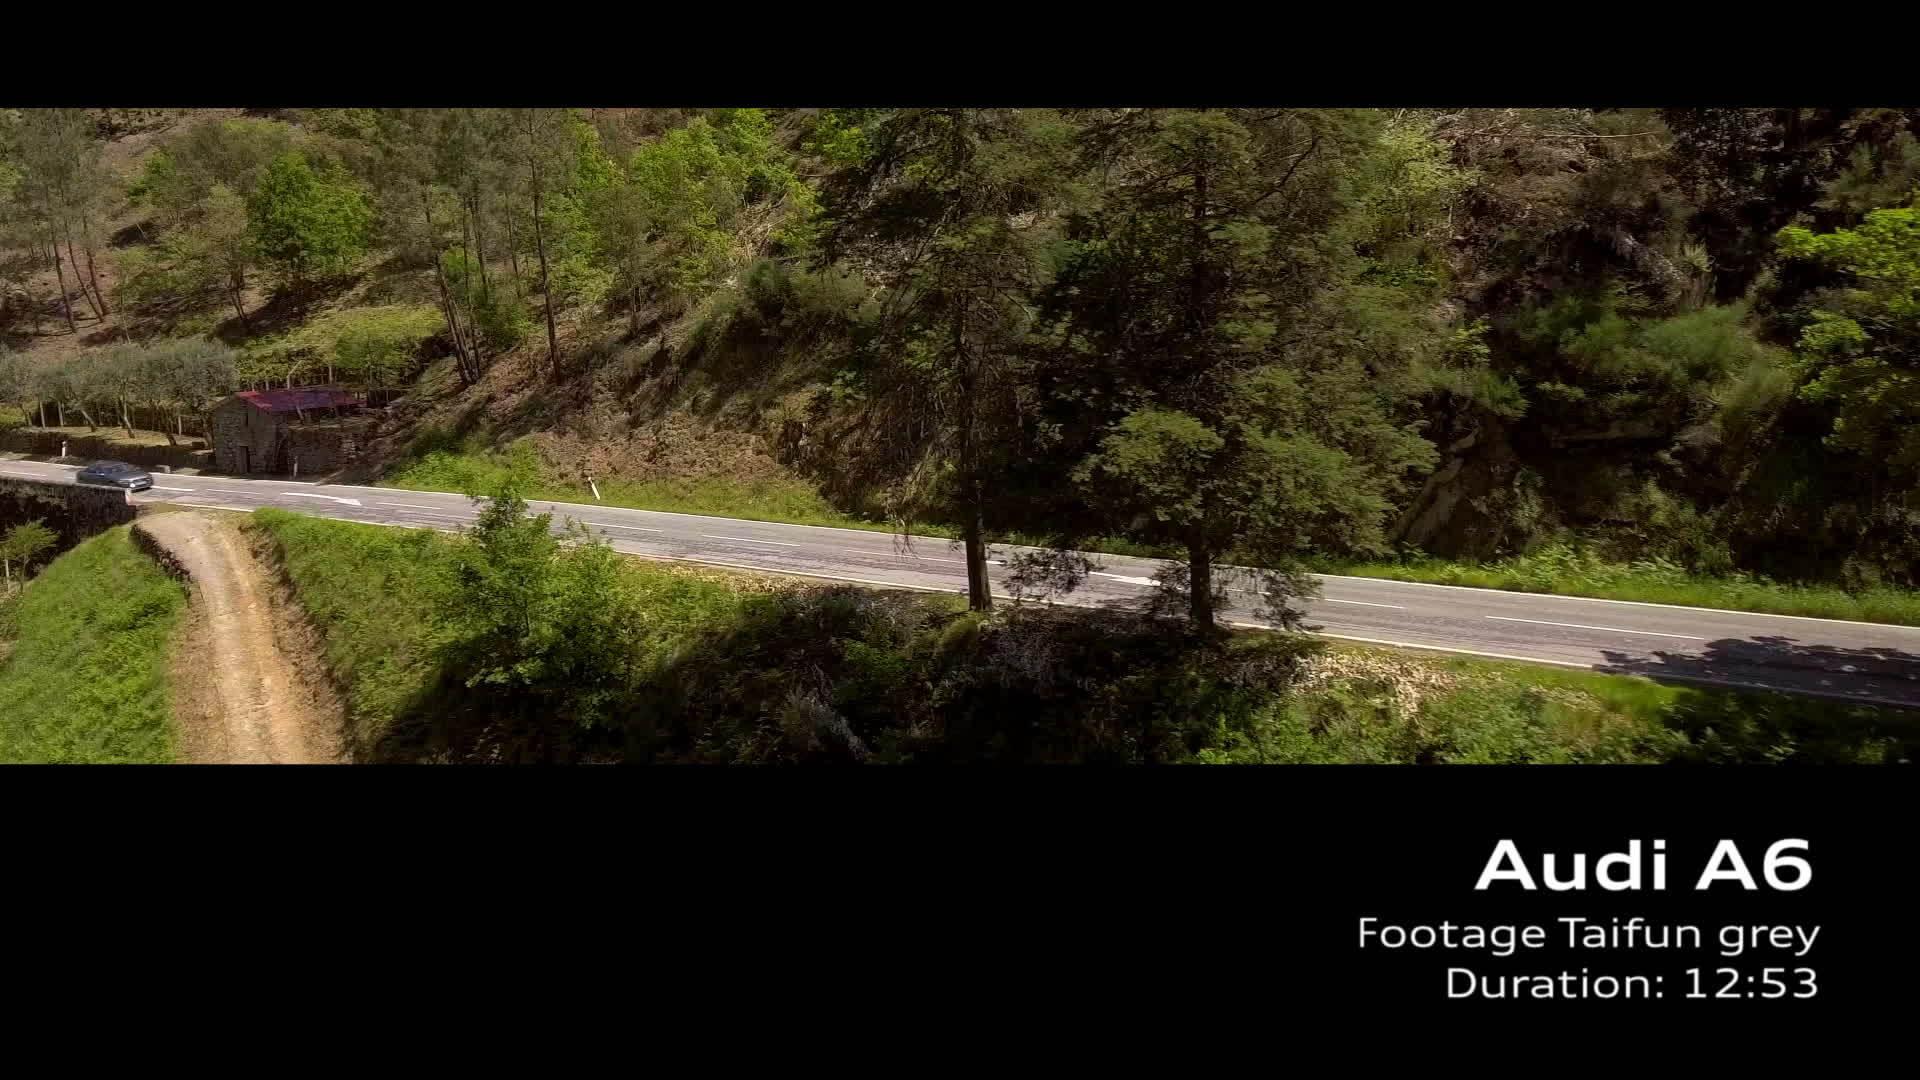 Audi A6 Footage Taifungrau